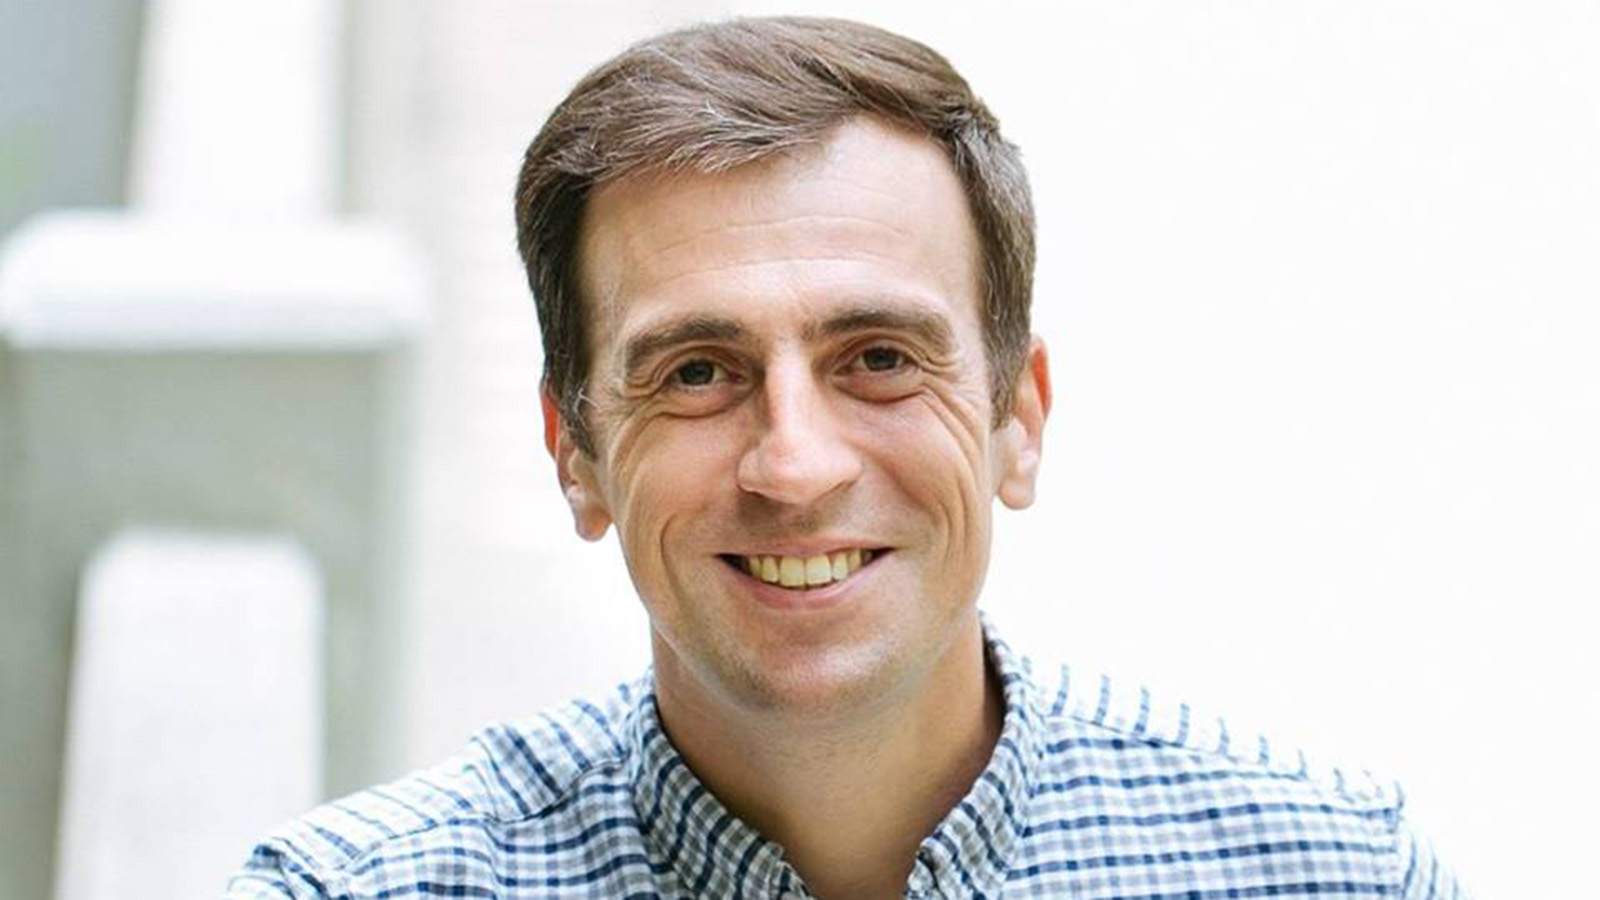 Human Rights Campaign Endorses Dan Feehan for Congress